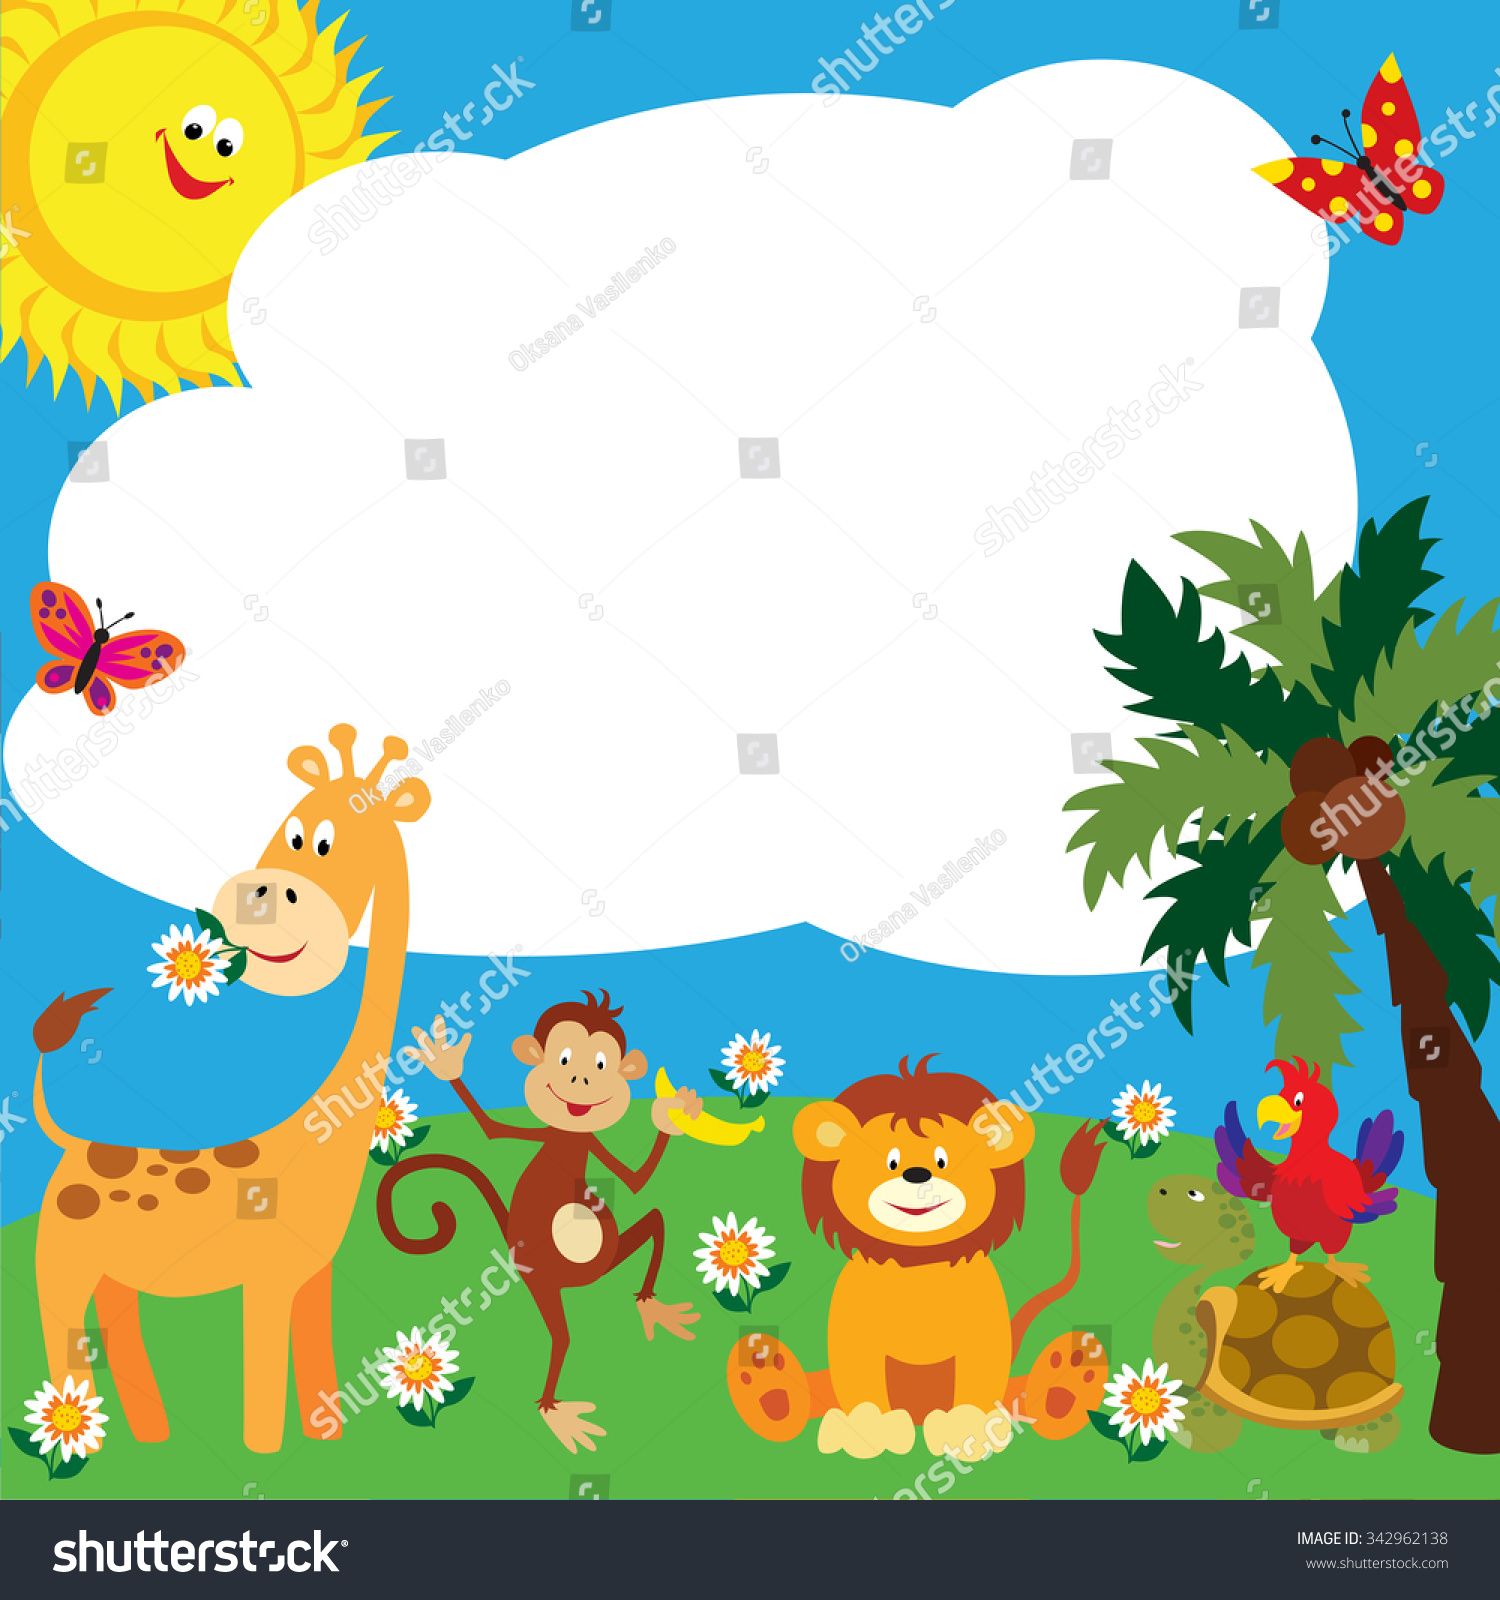 Royalty Free Cute Cartoon Animals Make A Colourful 342962138 Stock